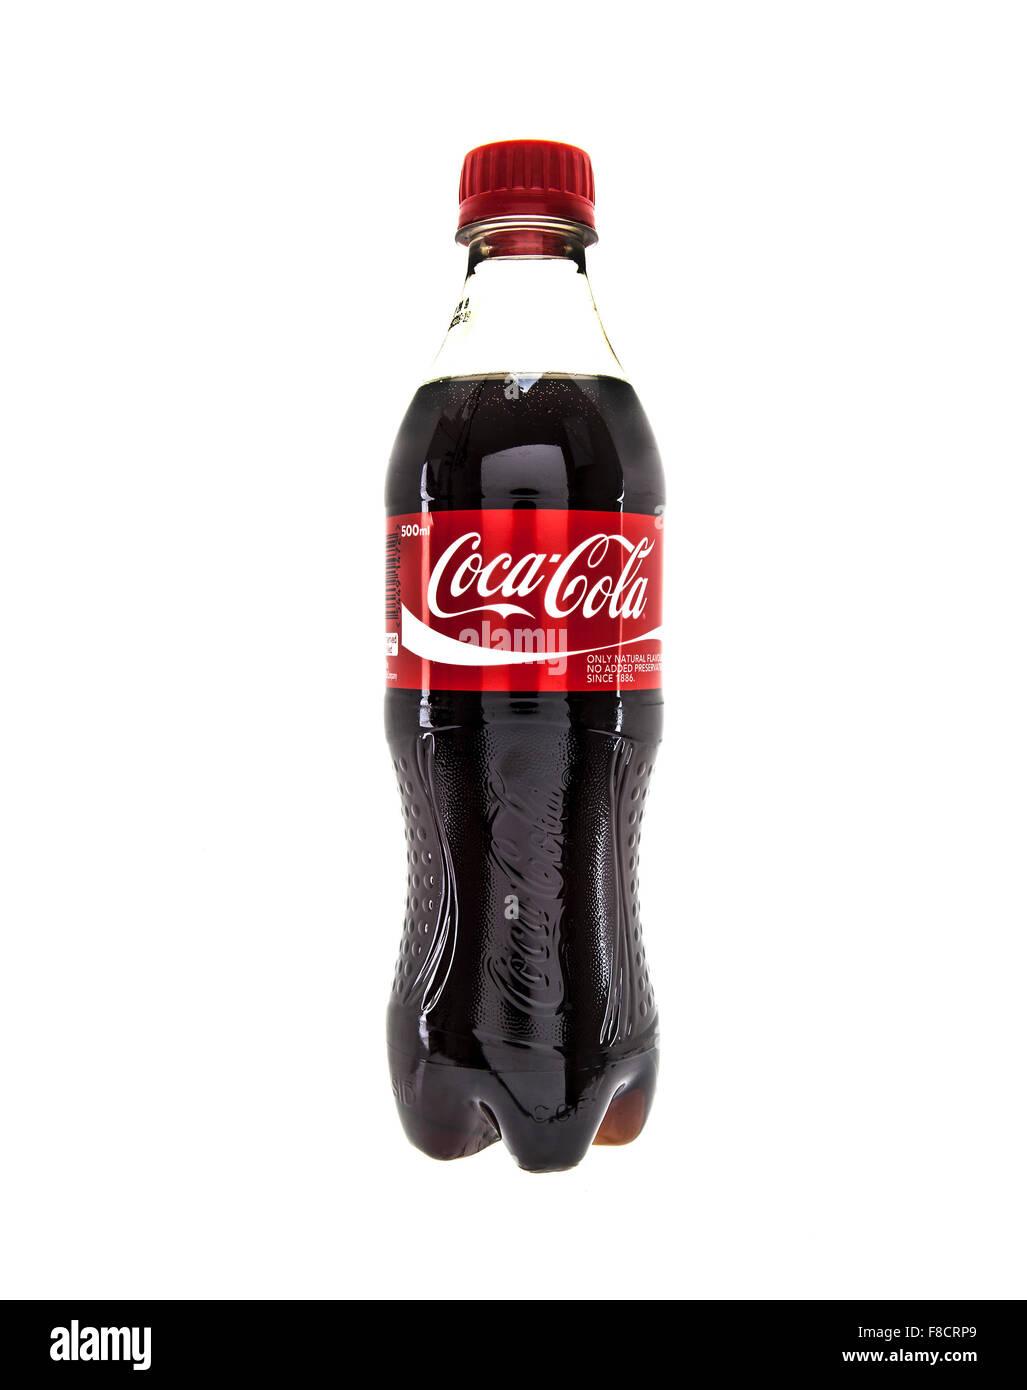 Coca-Cola Bottle on White Background - Stock Image